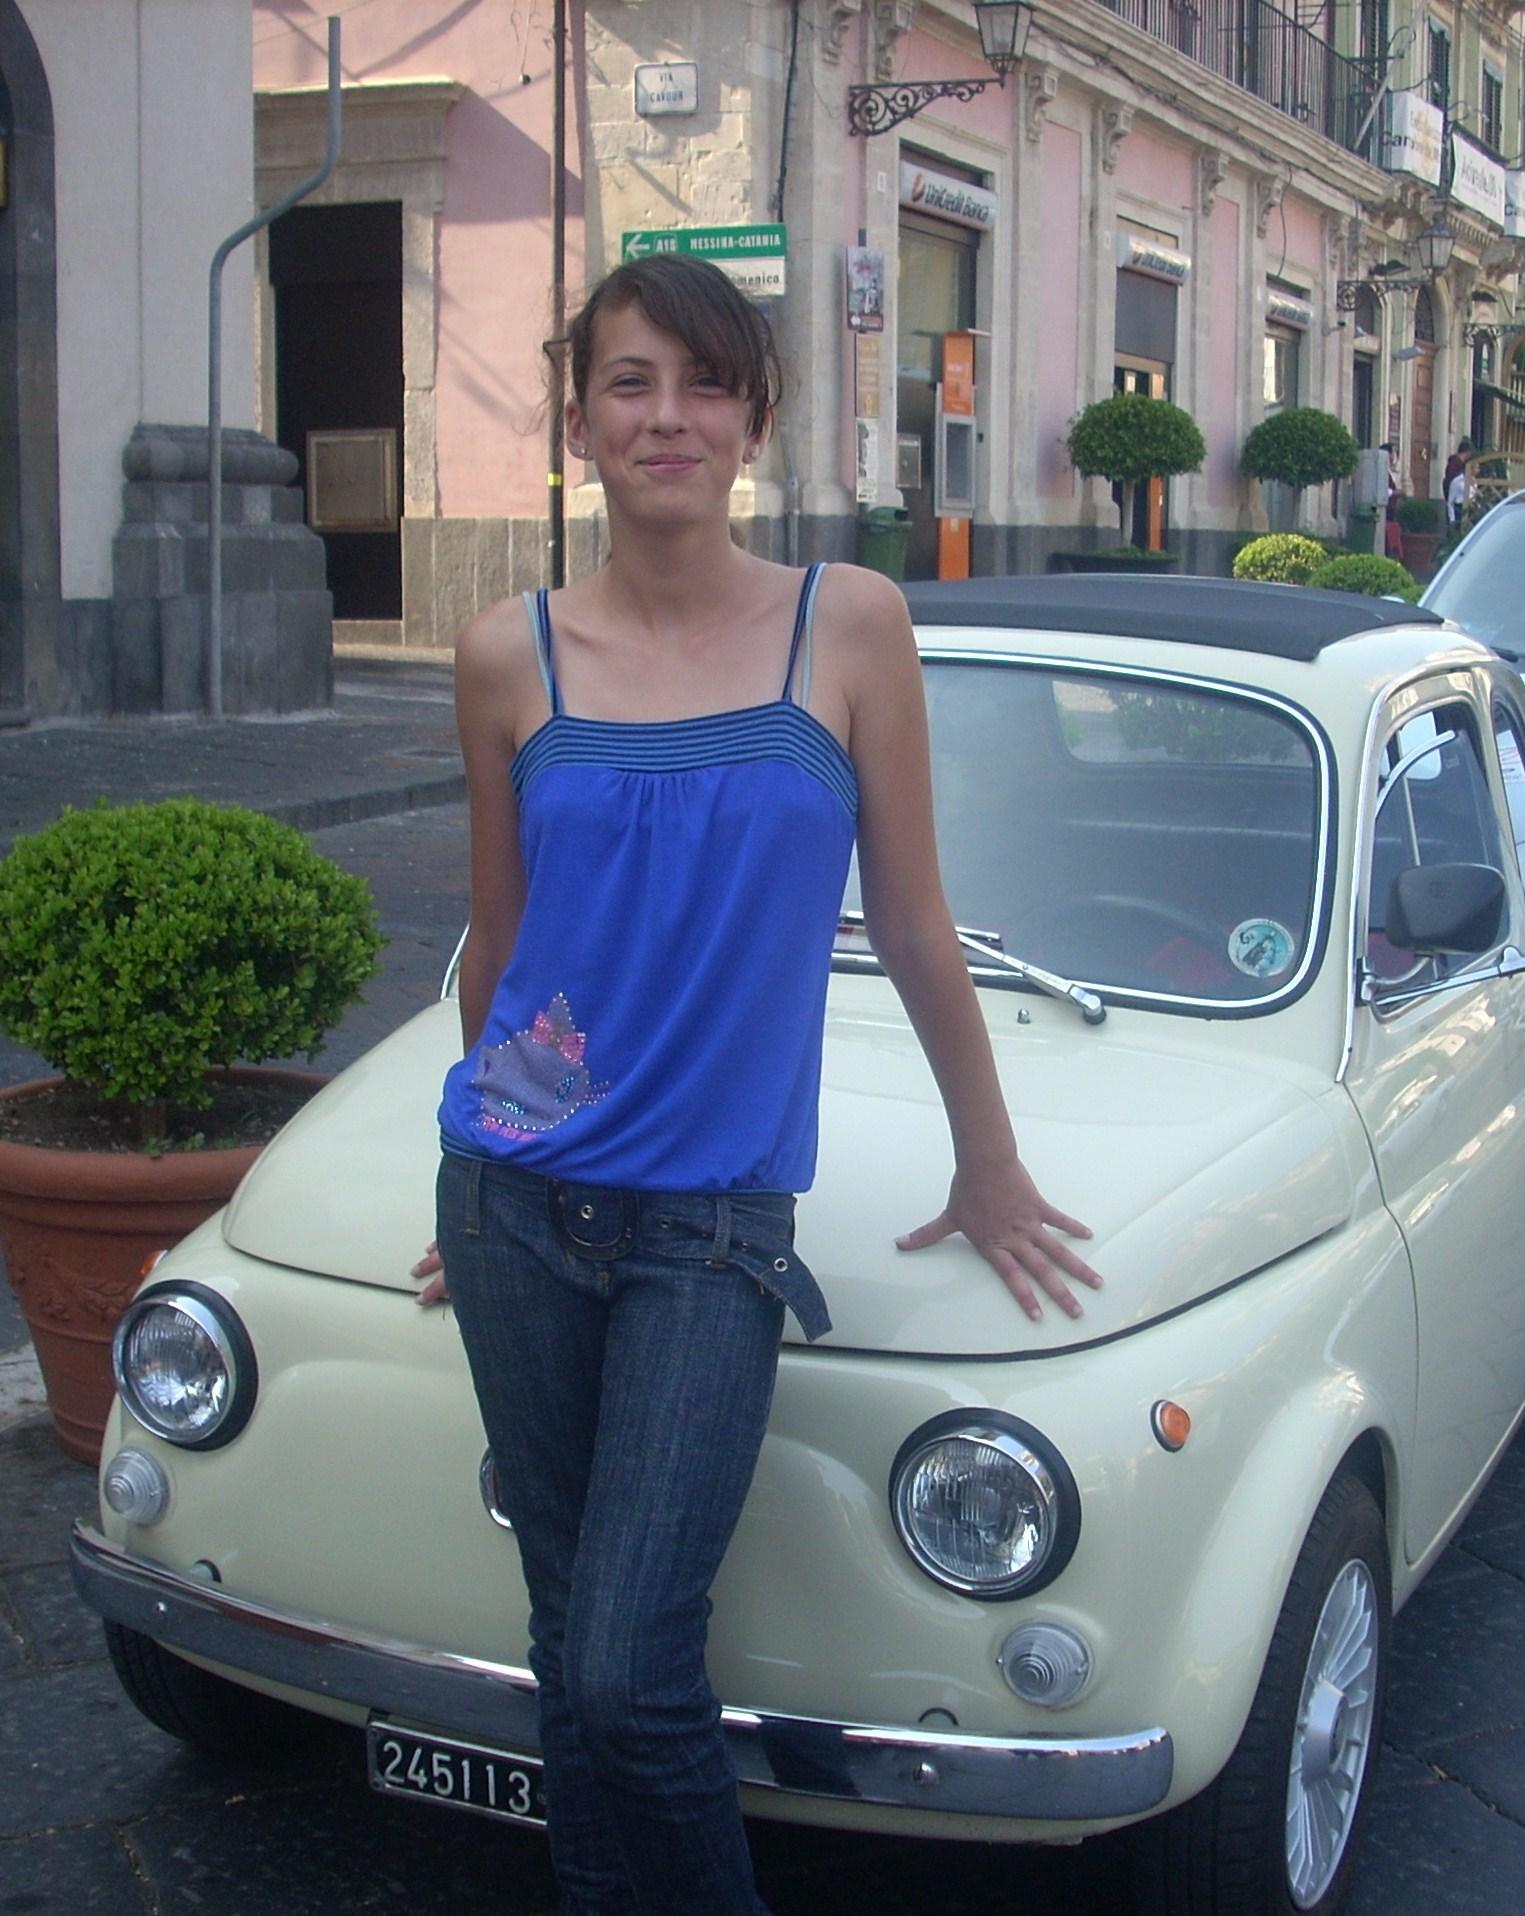 Description european teenage girl 2008 jpg